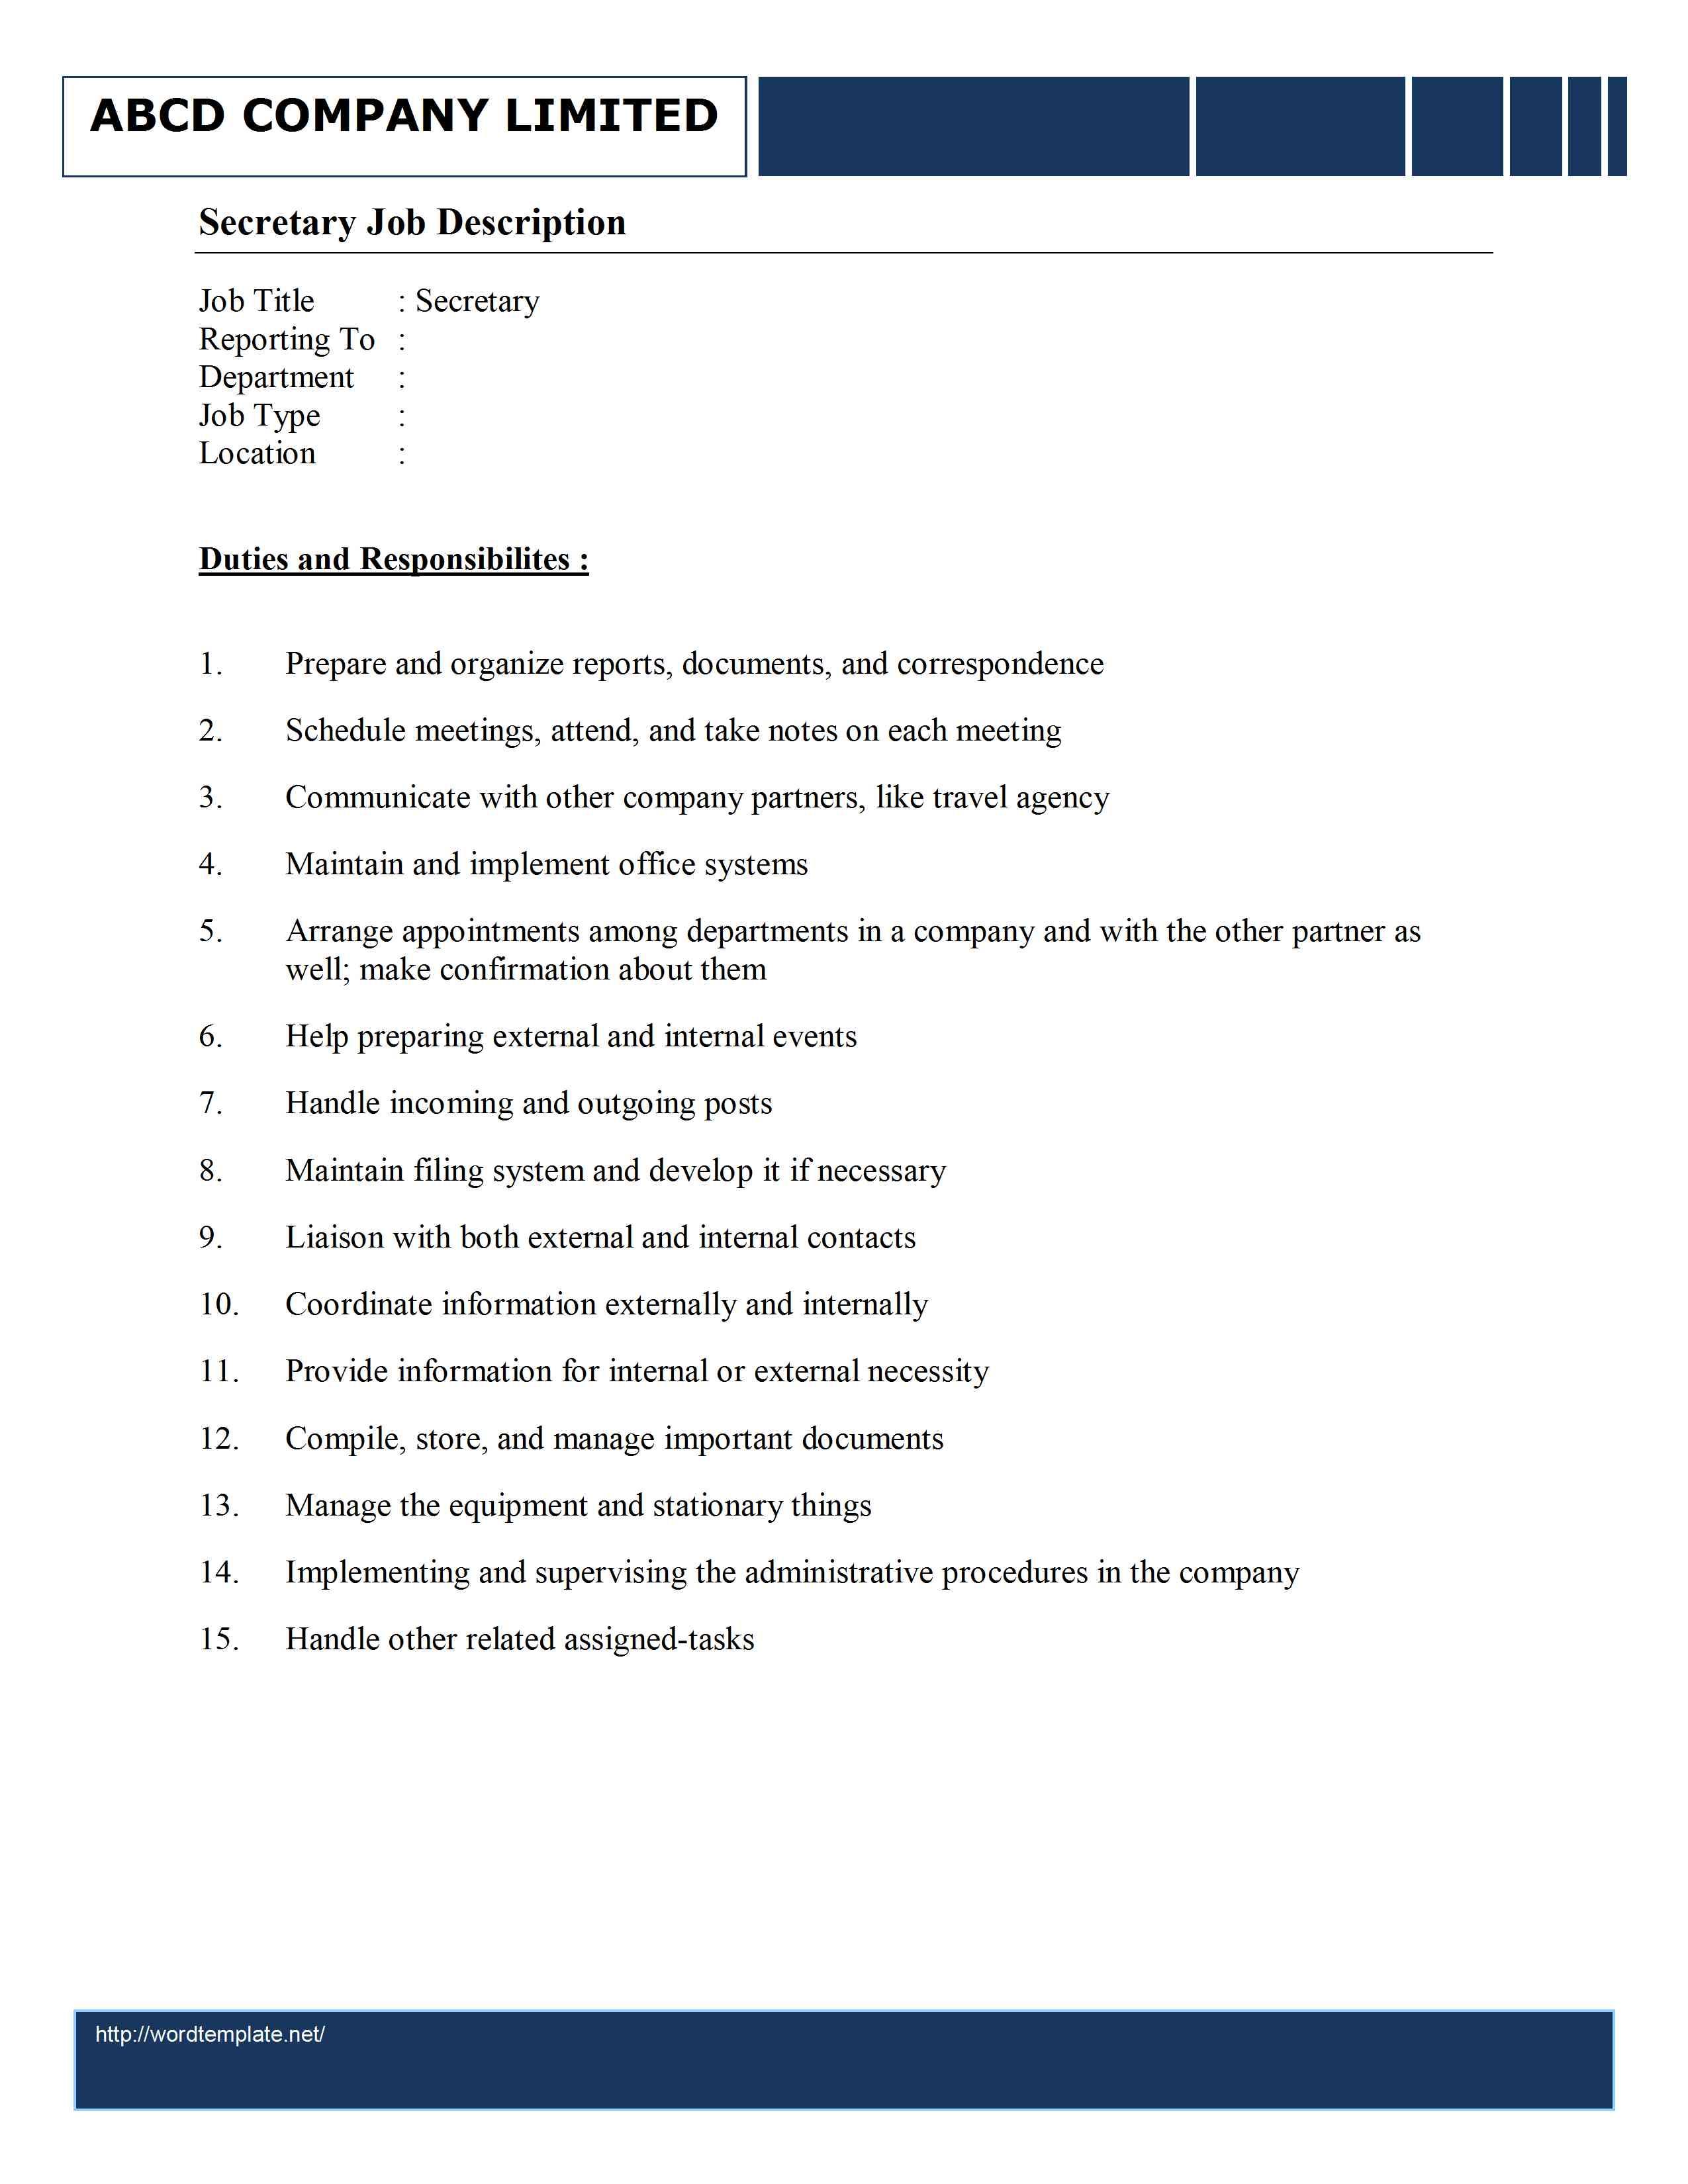 job description of senior waitress professional resume cover job description of senior waitress waitress job description lovetoknow secretary job description 791x1024 secretary job description